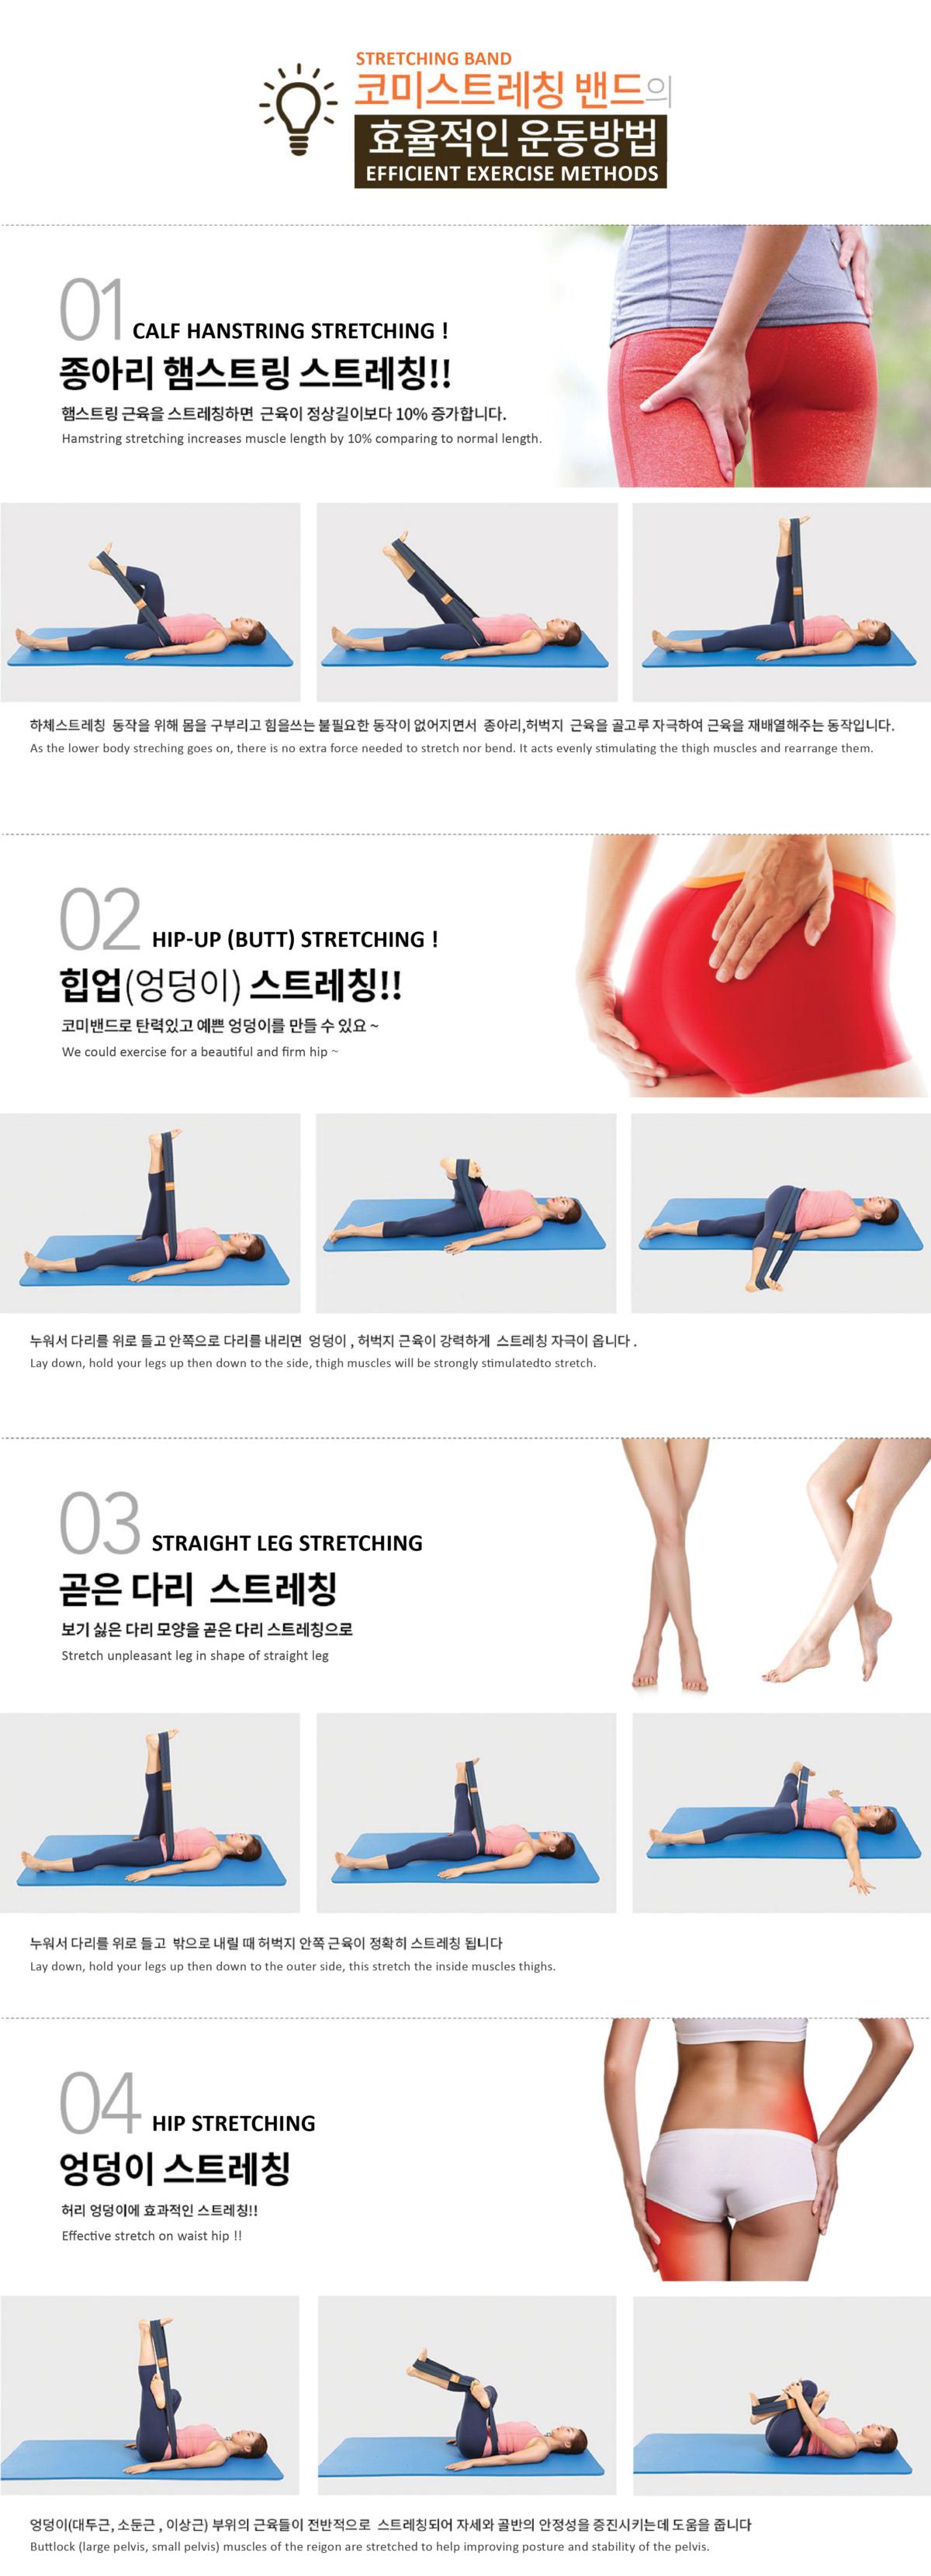 Stretching Band 拉筋繩